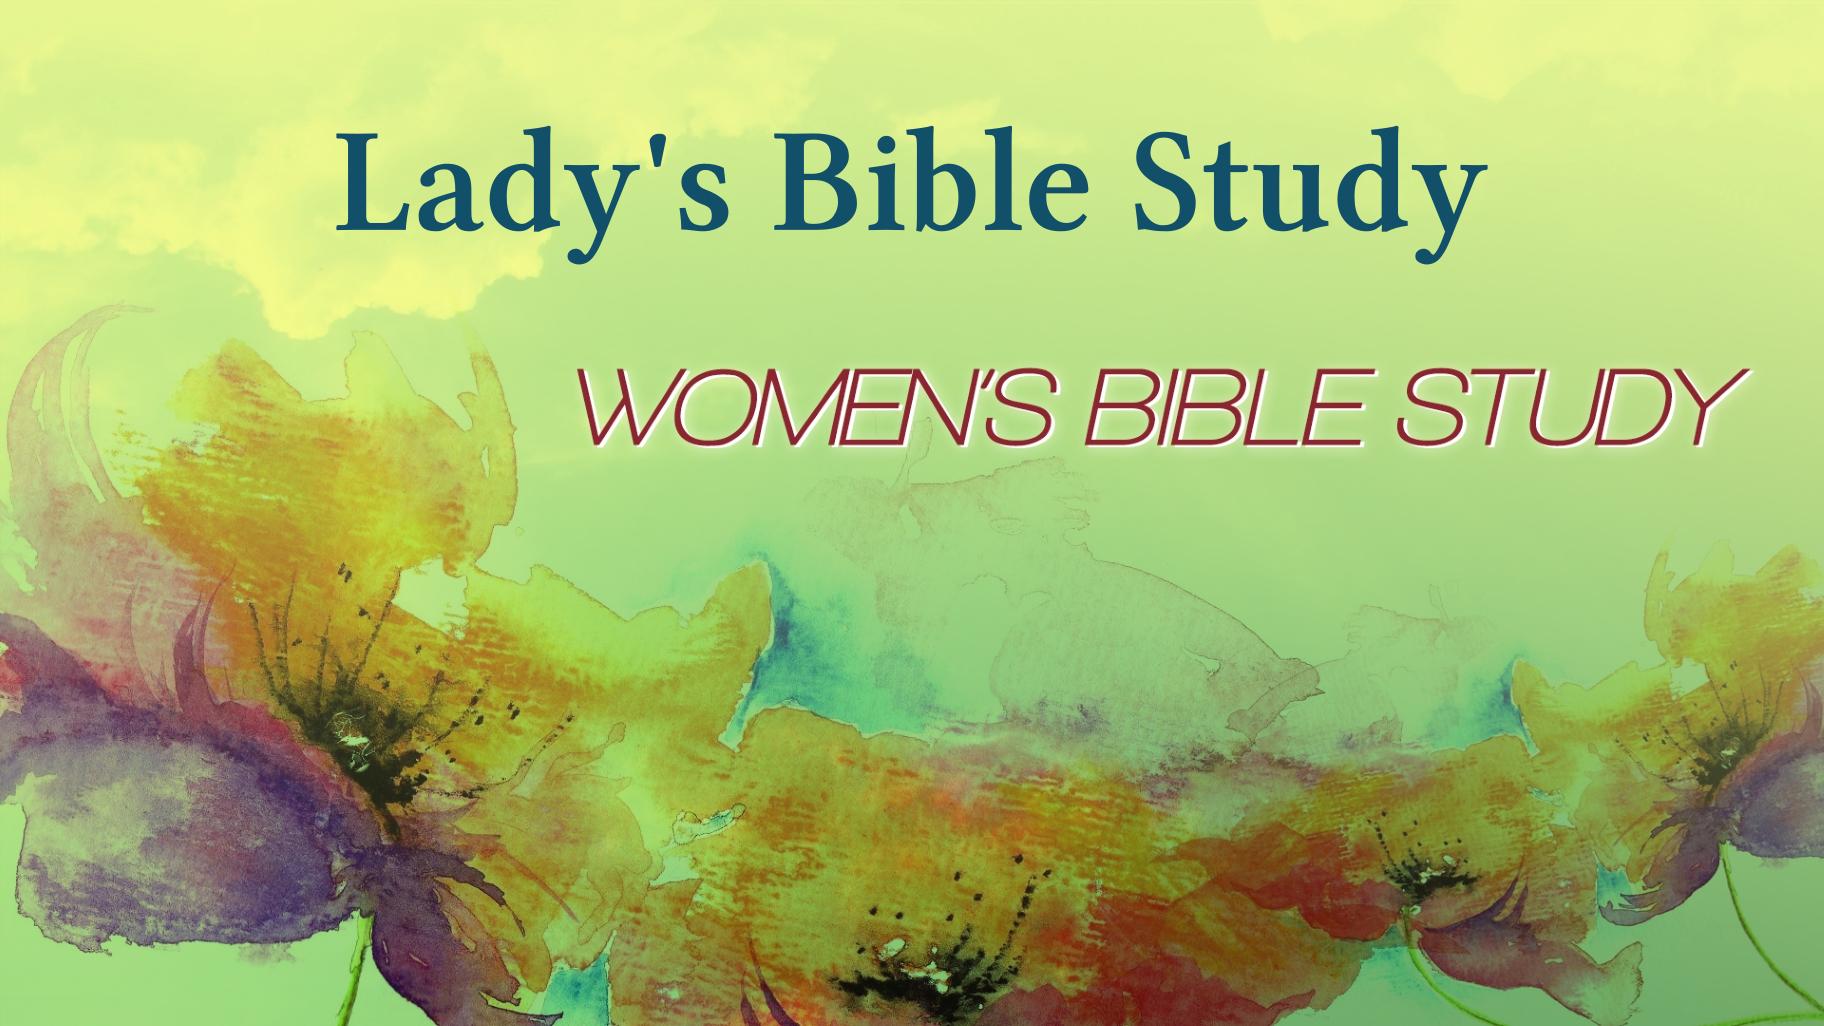 Lady's Bible Study